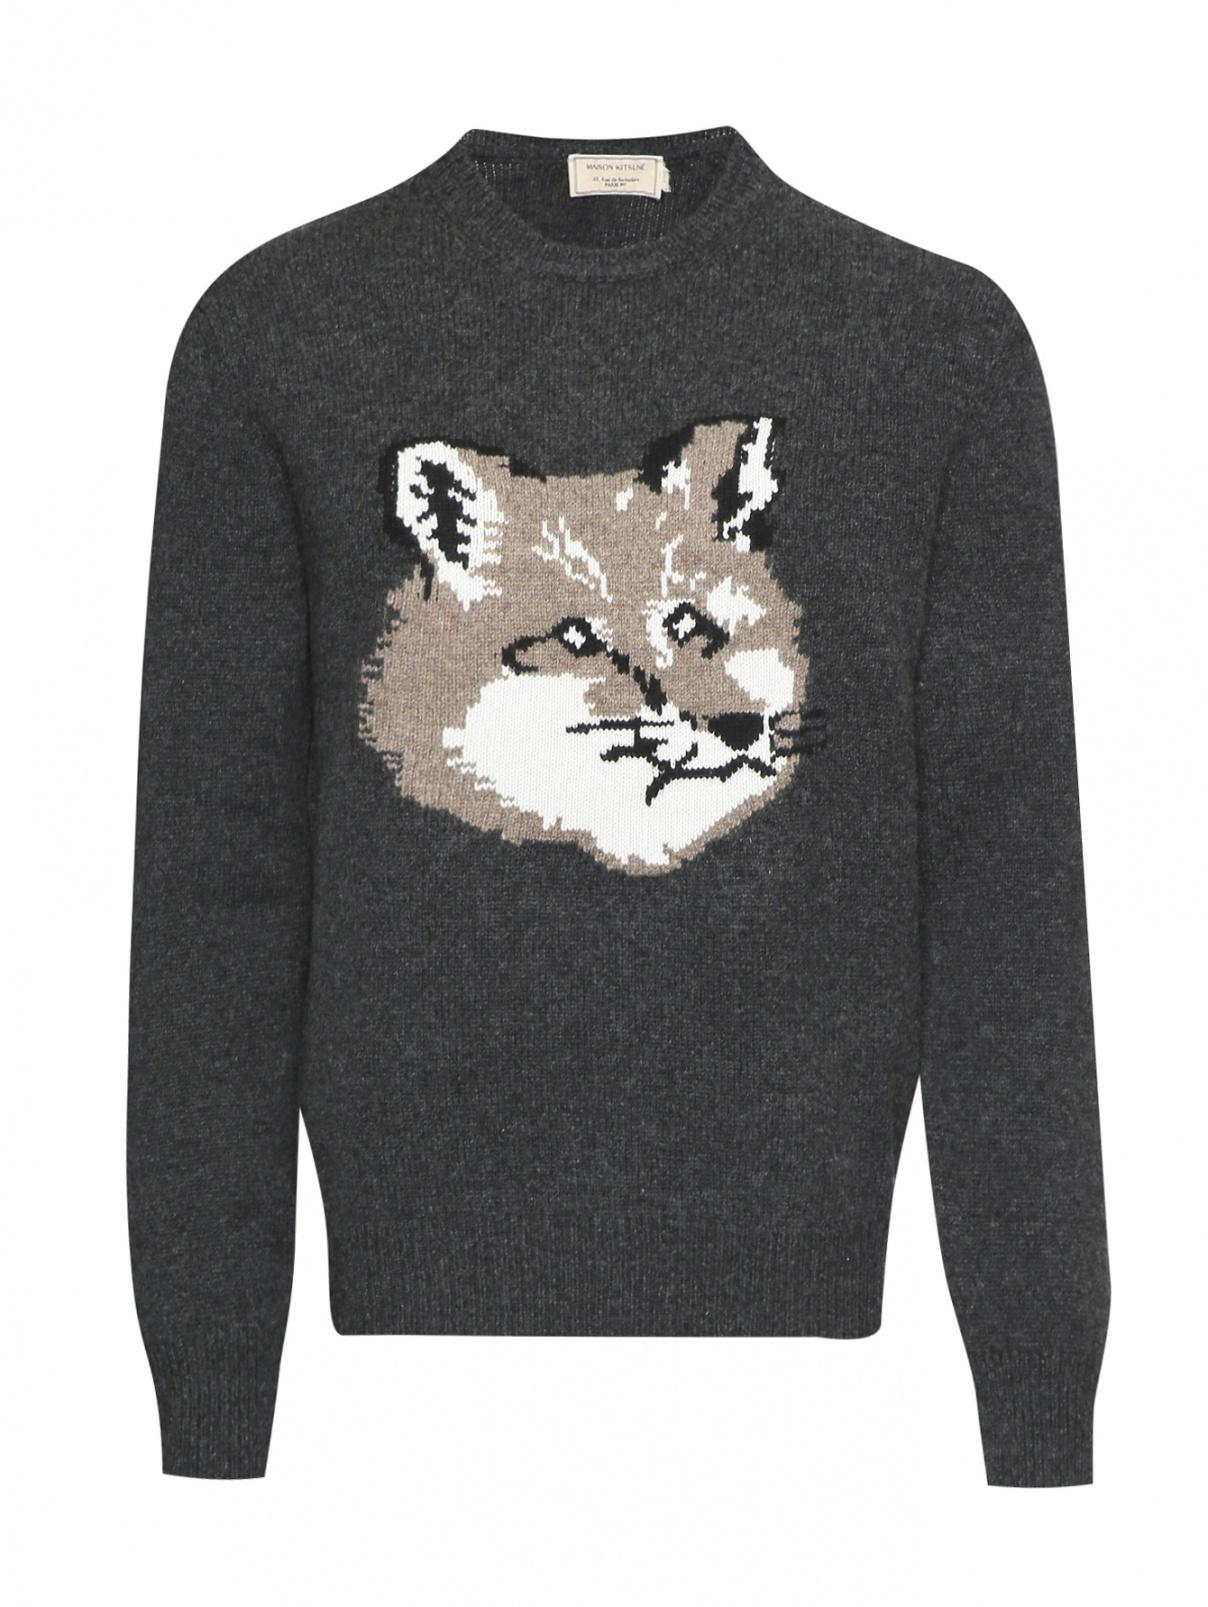 Джемпер из шерсти с узором Maison Kitsune  –  Общий вид